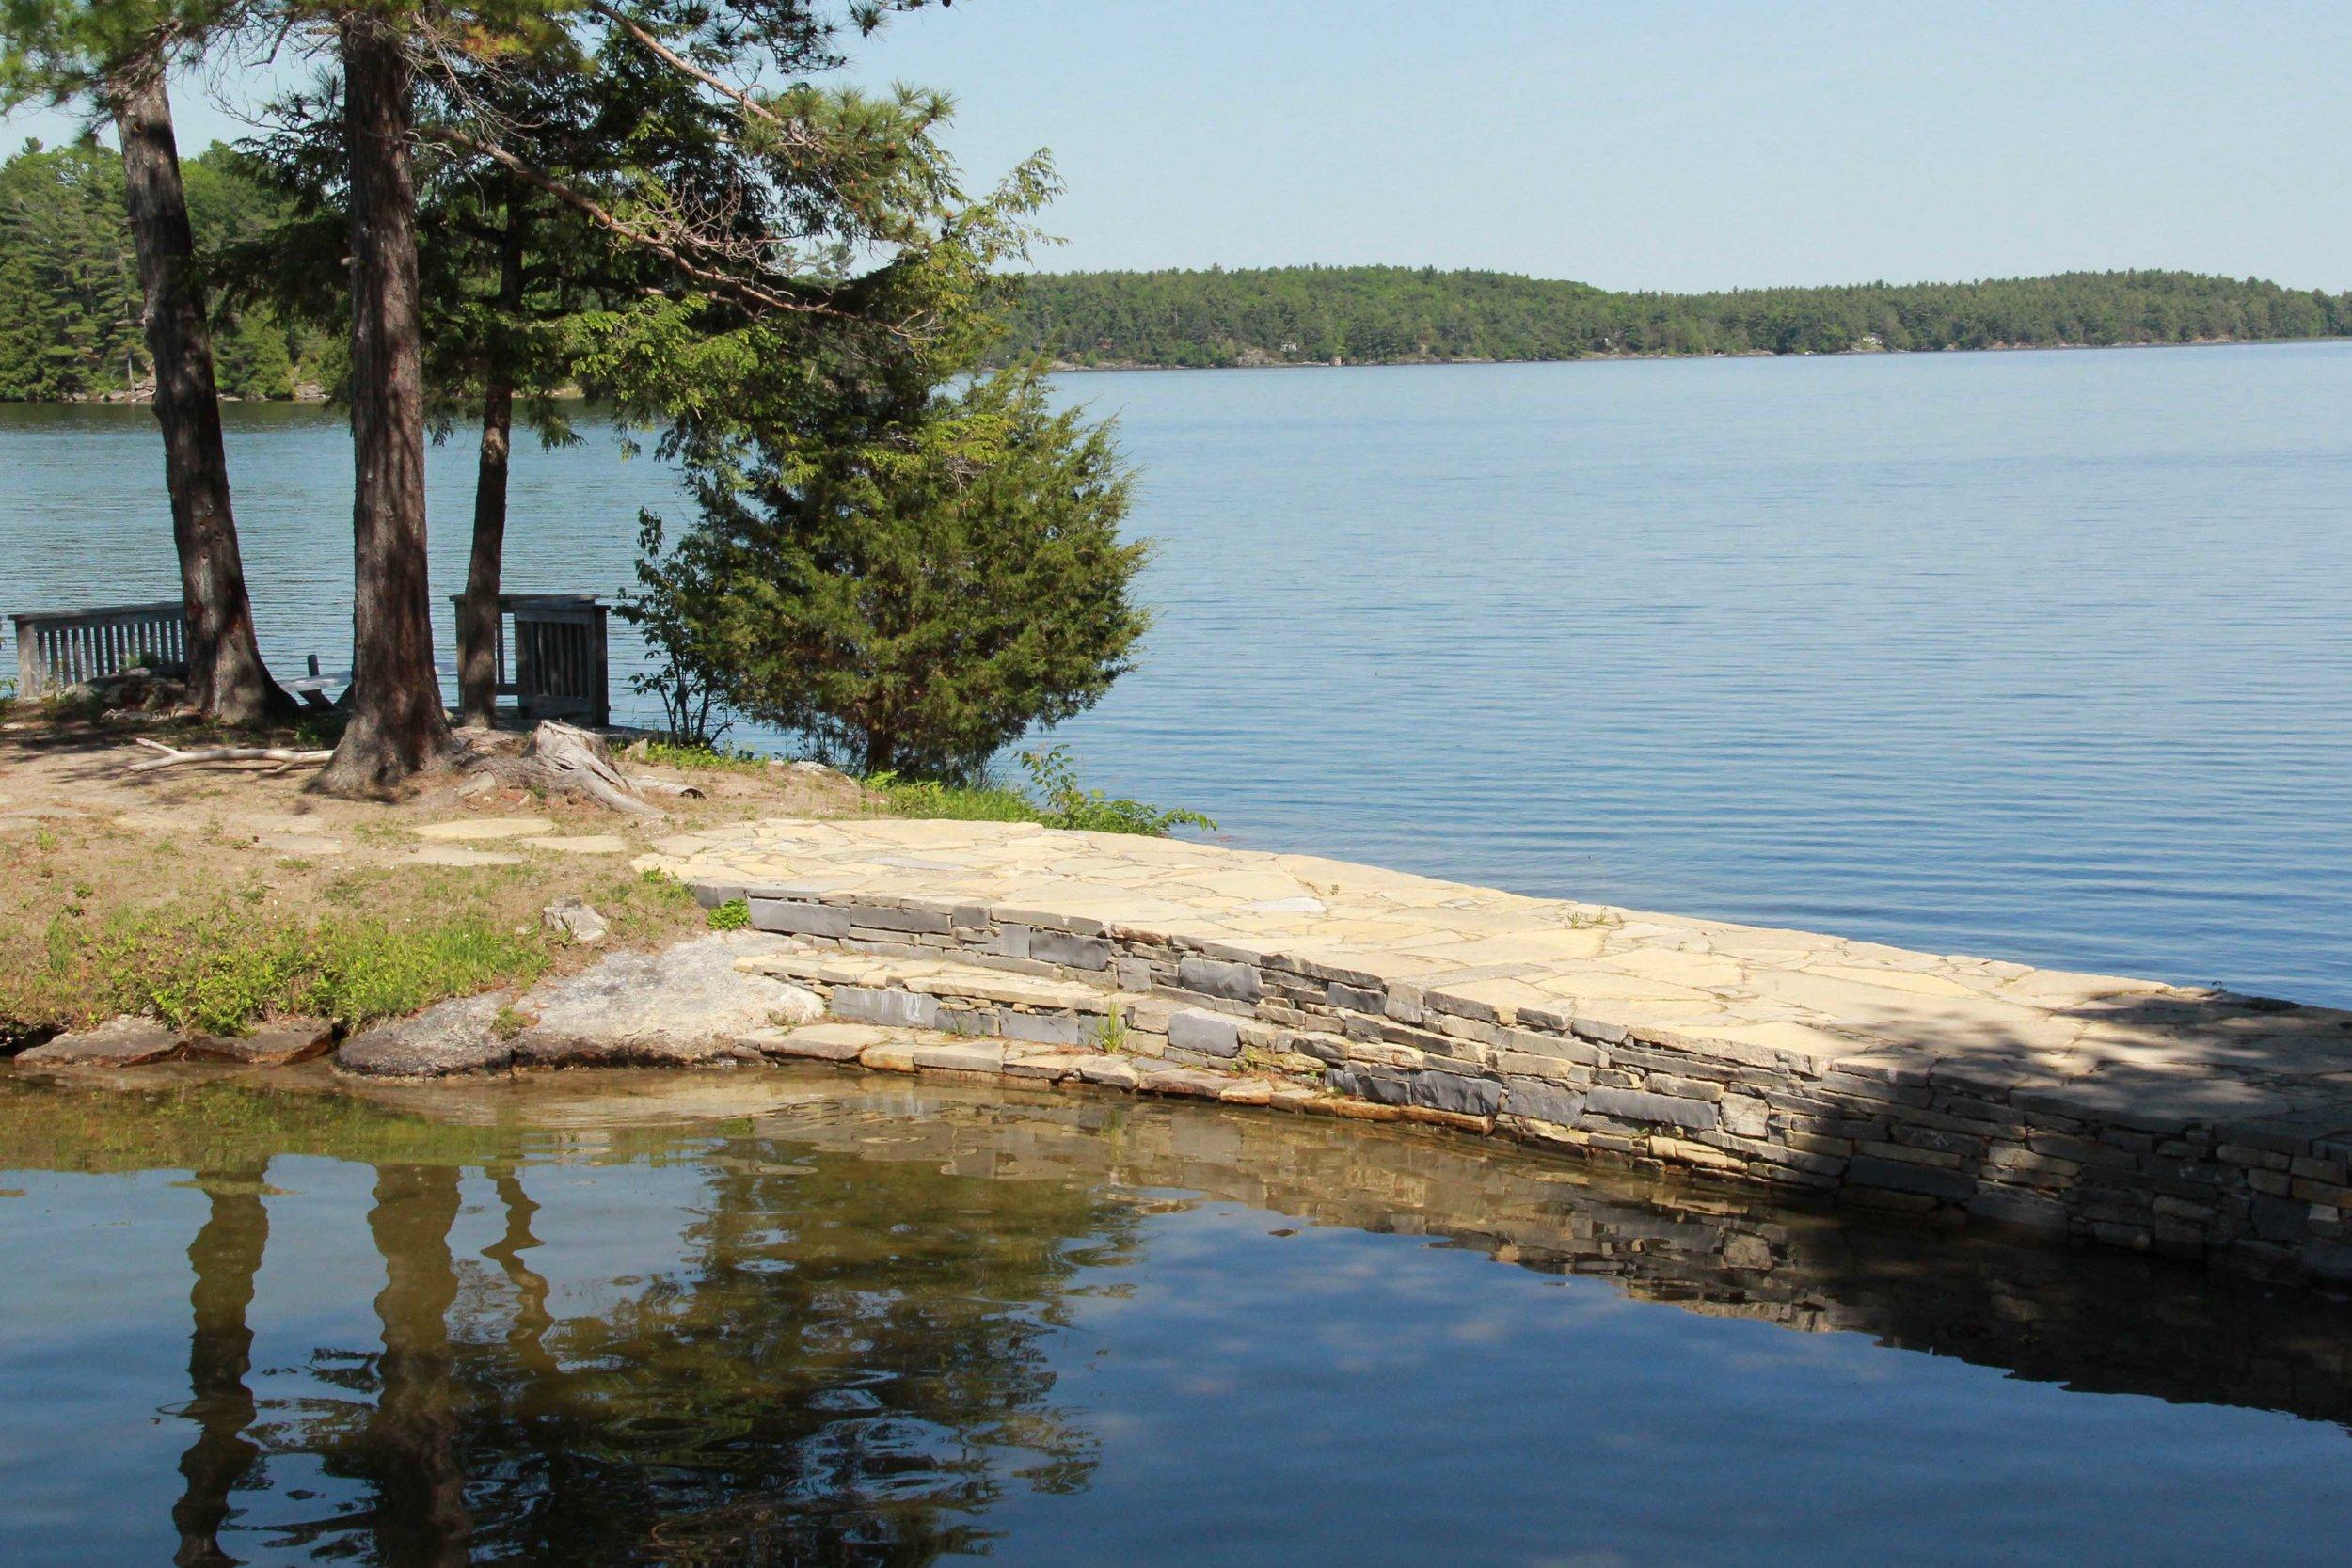 Riverview Landscape_Charleston Lake_Drylaid Stone Causeway - Copy.jpg